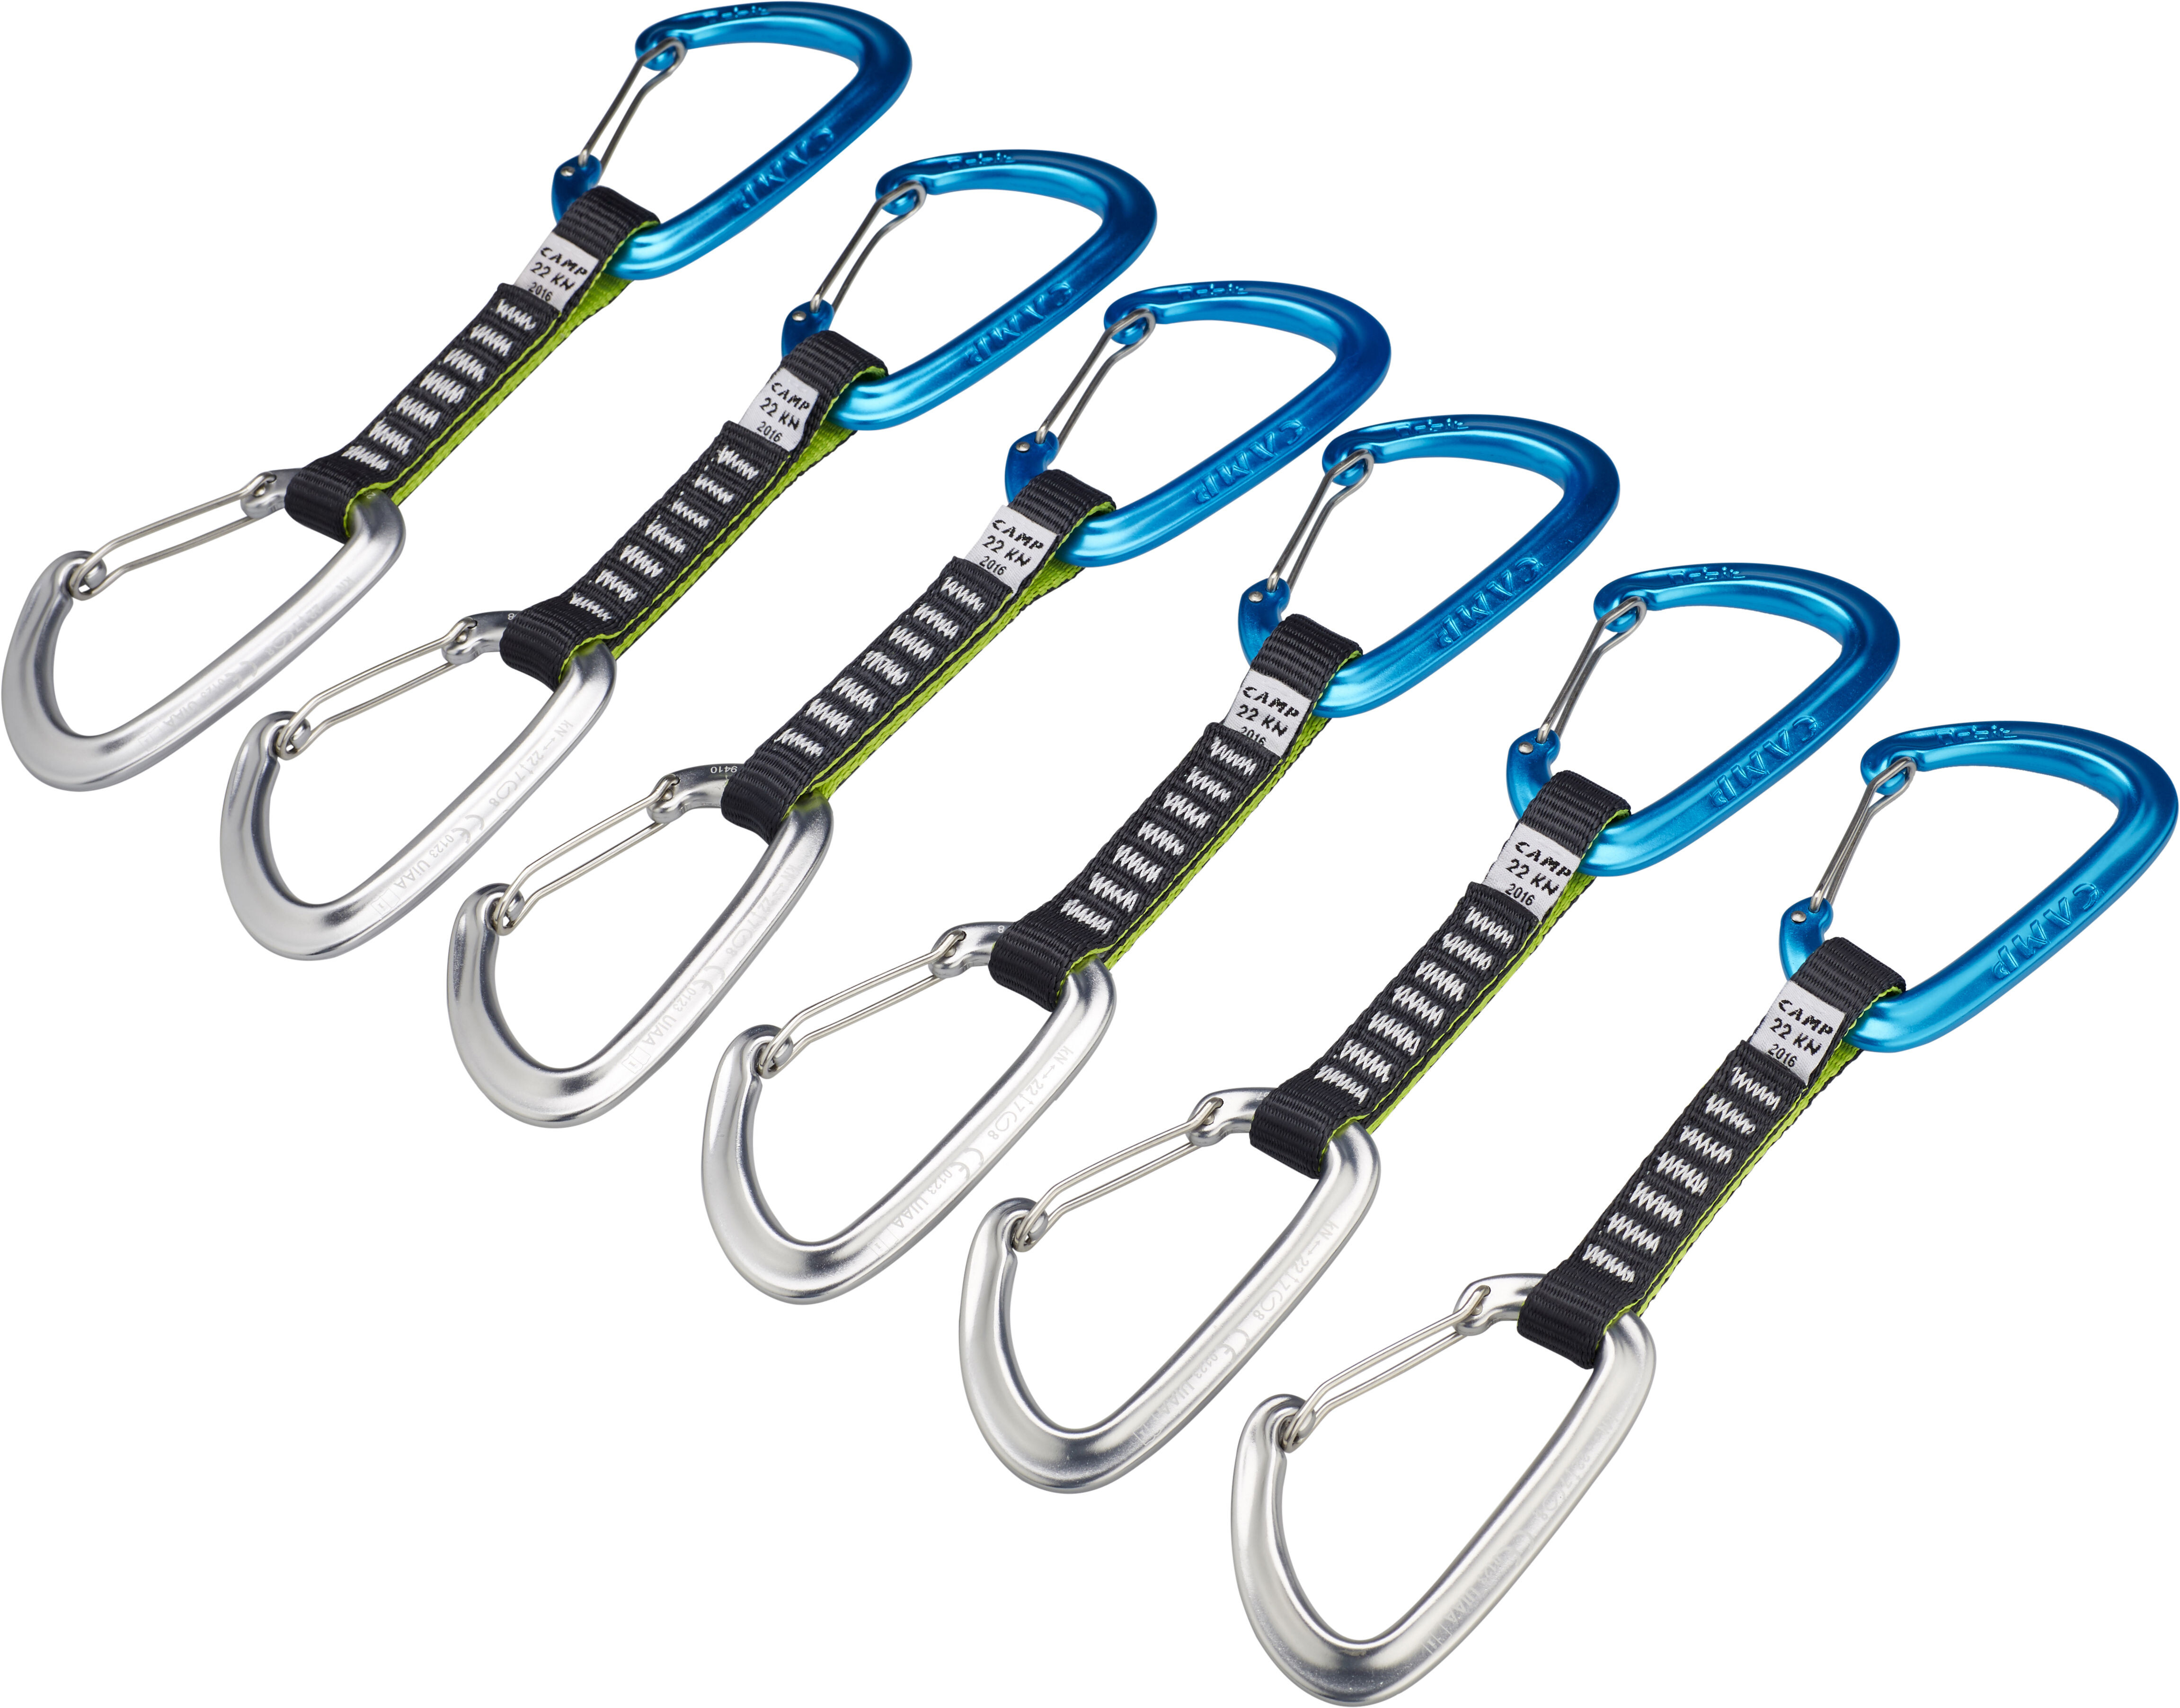 Wire Express   Camp Orbit Wire Express 6 Pack Quickdraws 11 Cm Campz De